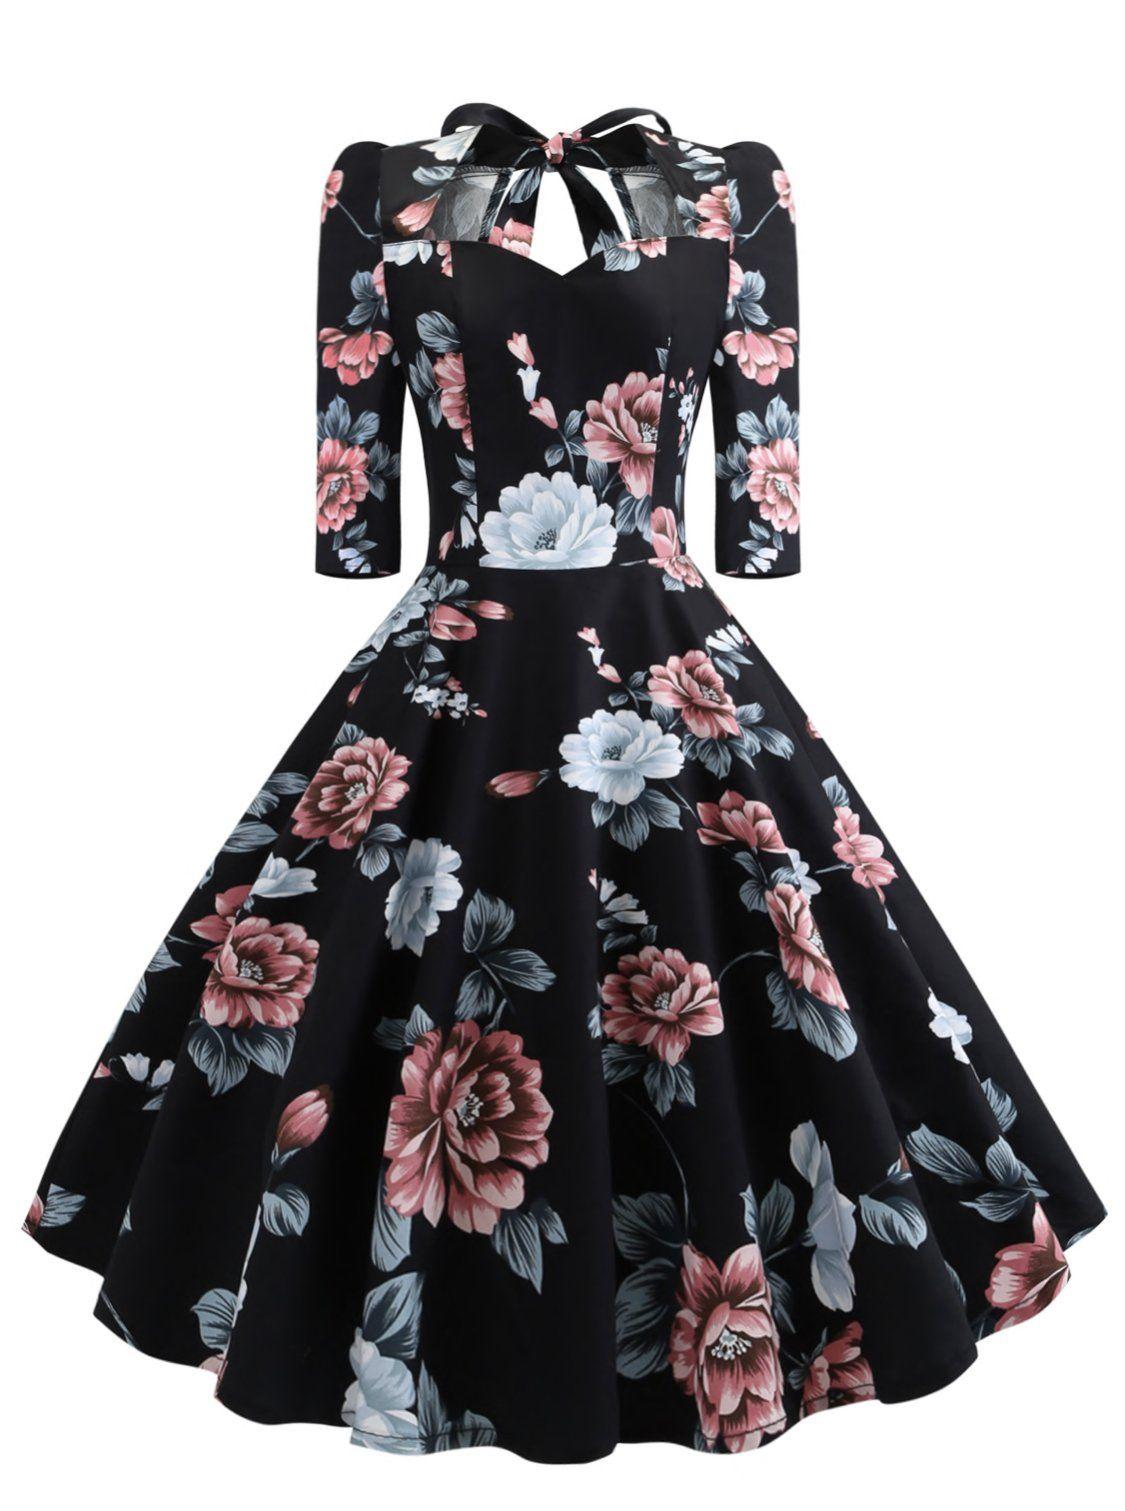 Signora 50s Floral Bow Knot Dress ในปี 2019 ชุดเดรส